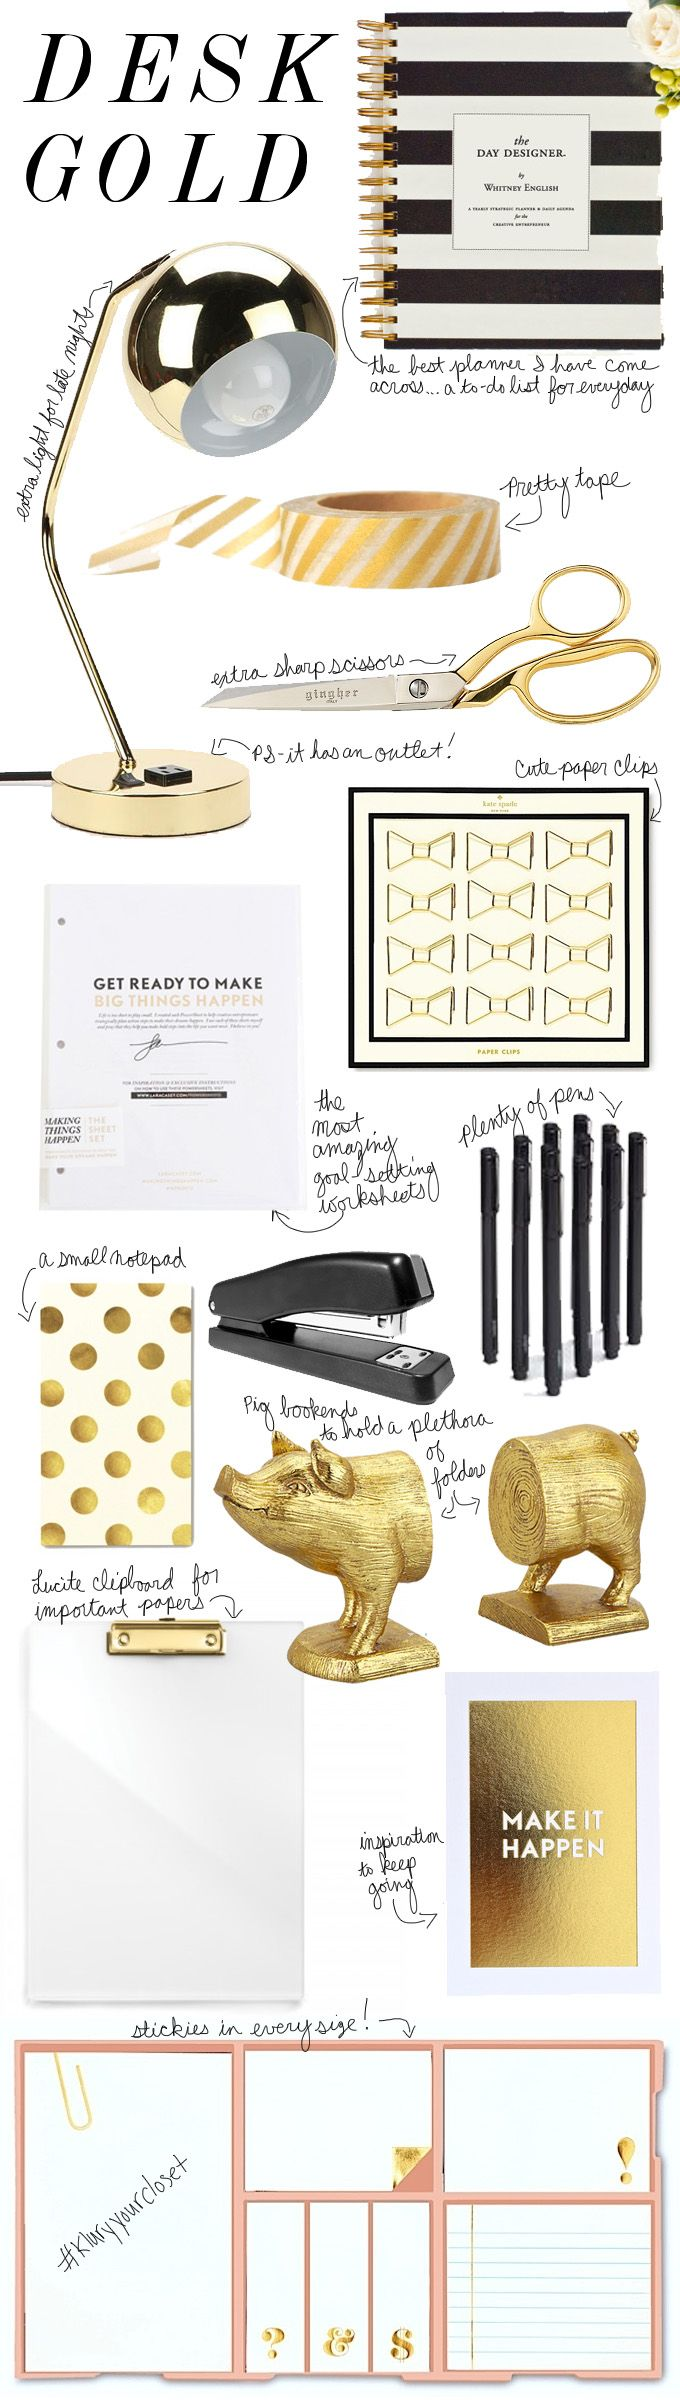 Exellent Desk Accessories For Women Blue Klurydotcom I Intended Design Ideas